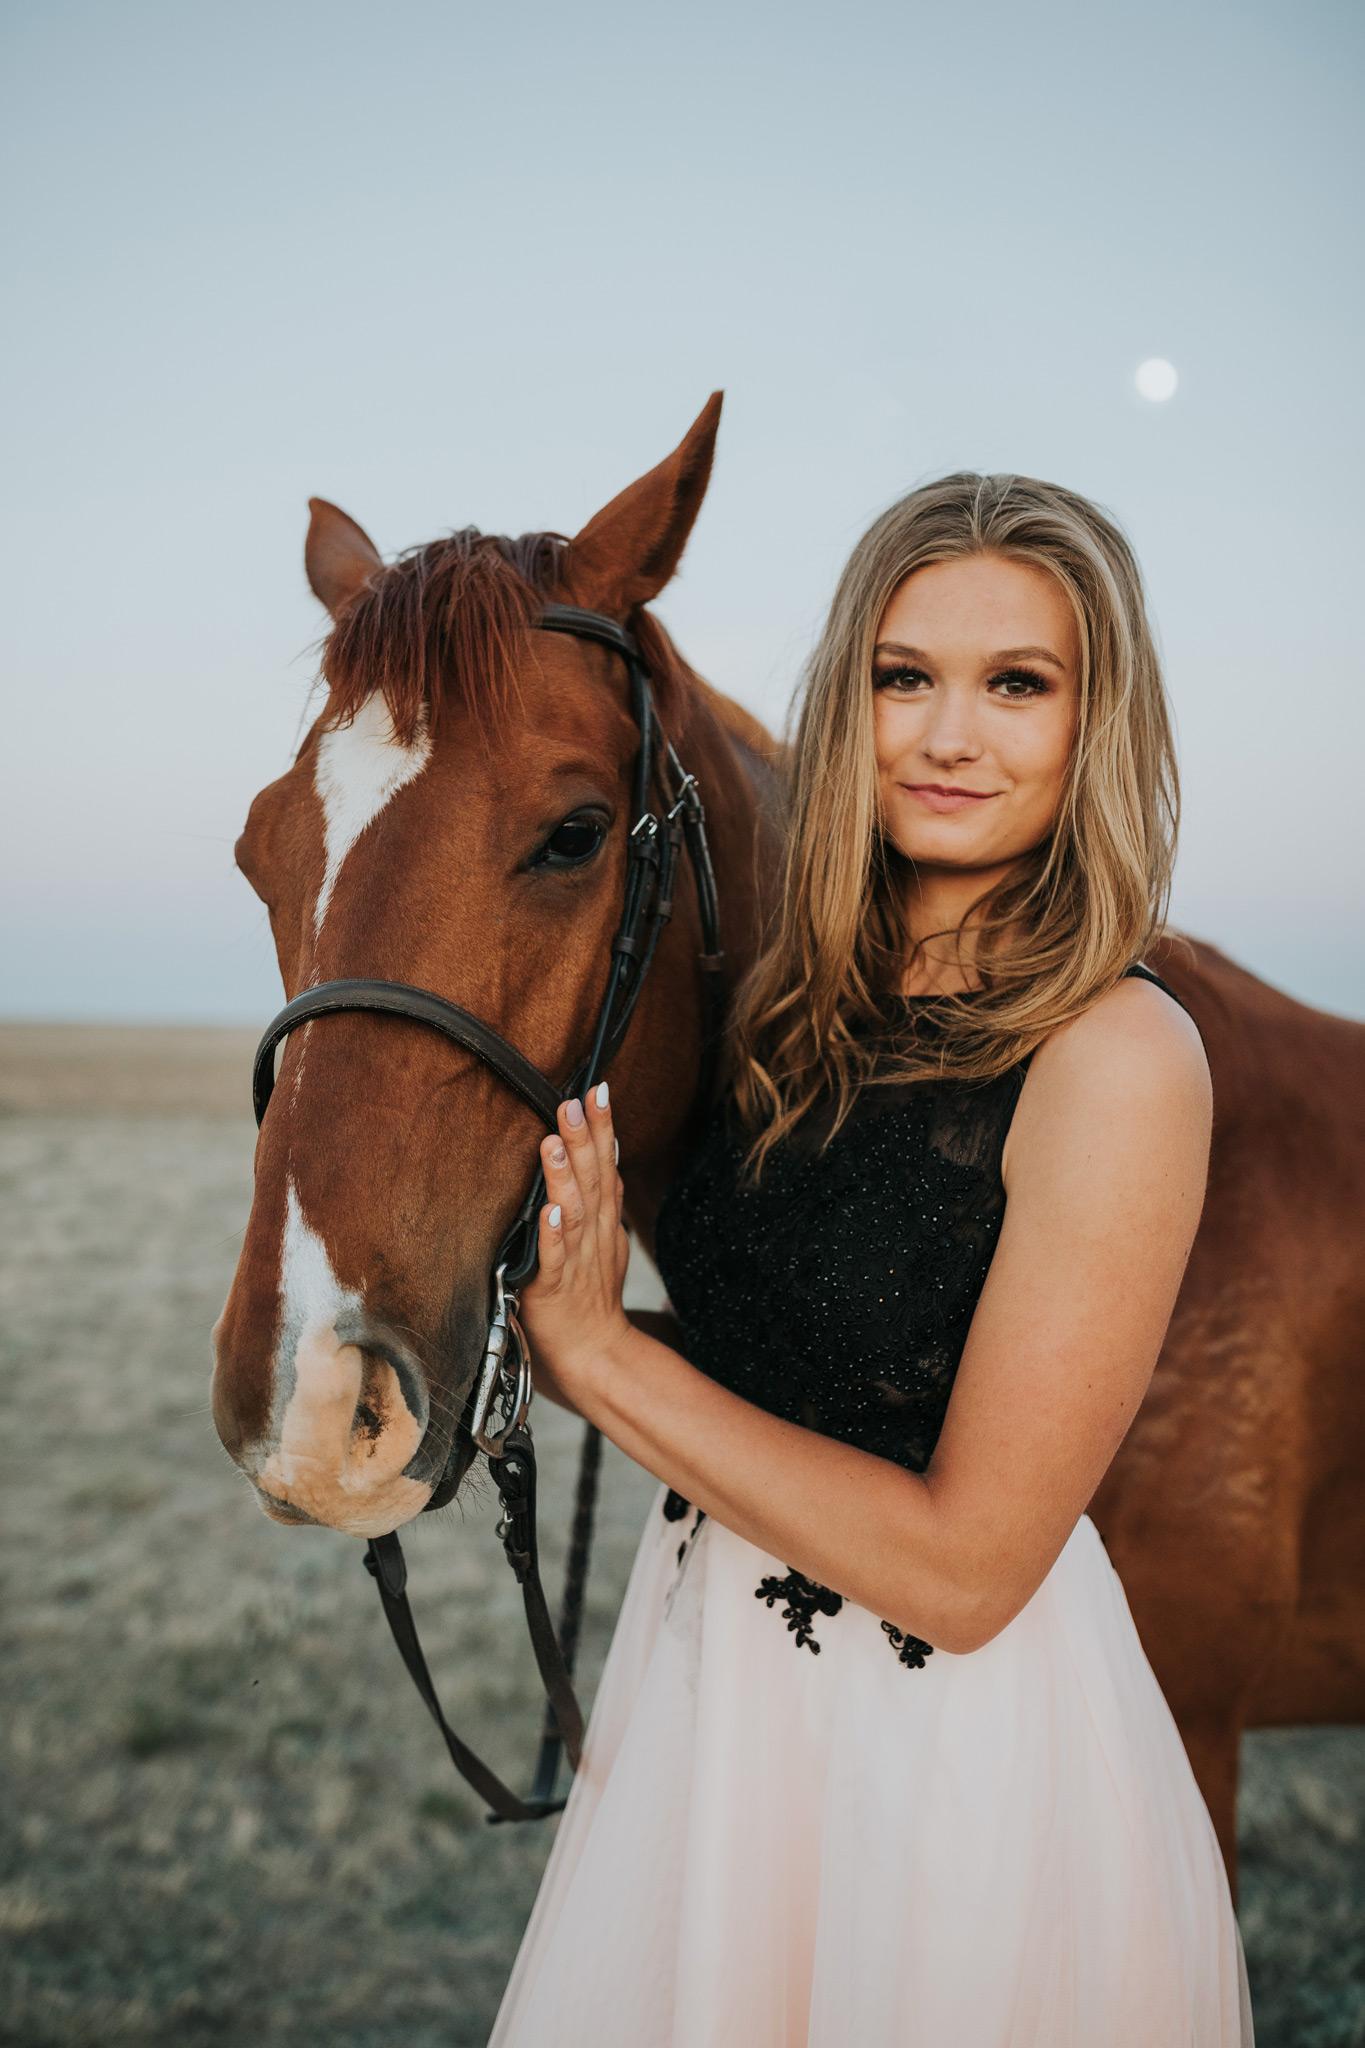 grad girl standing beside horse equine photo